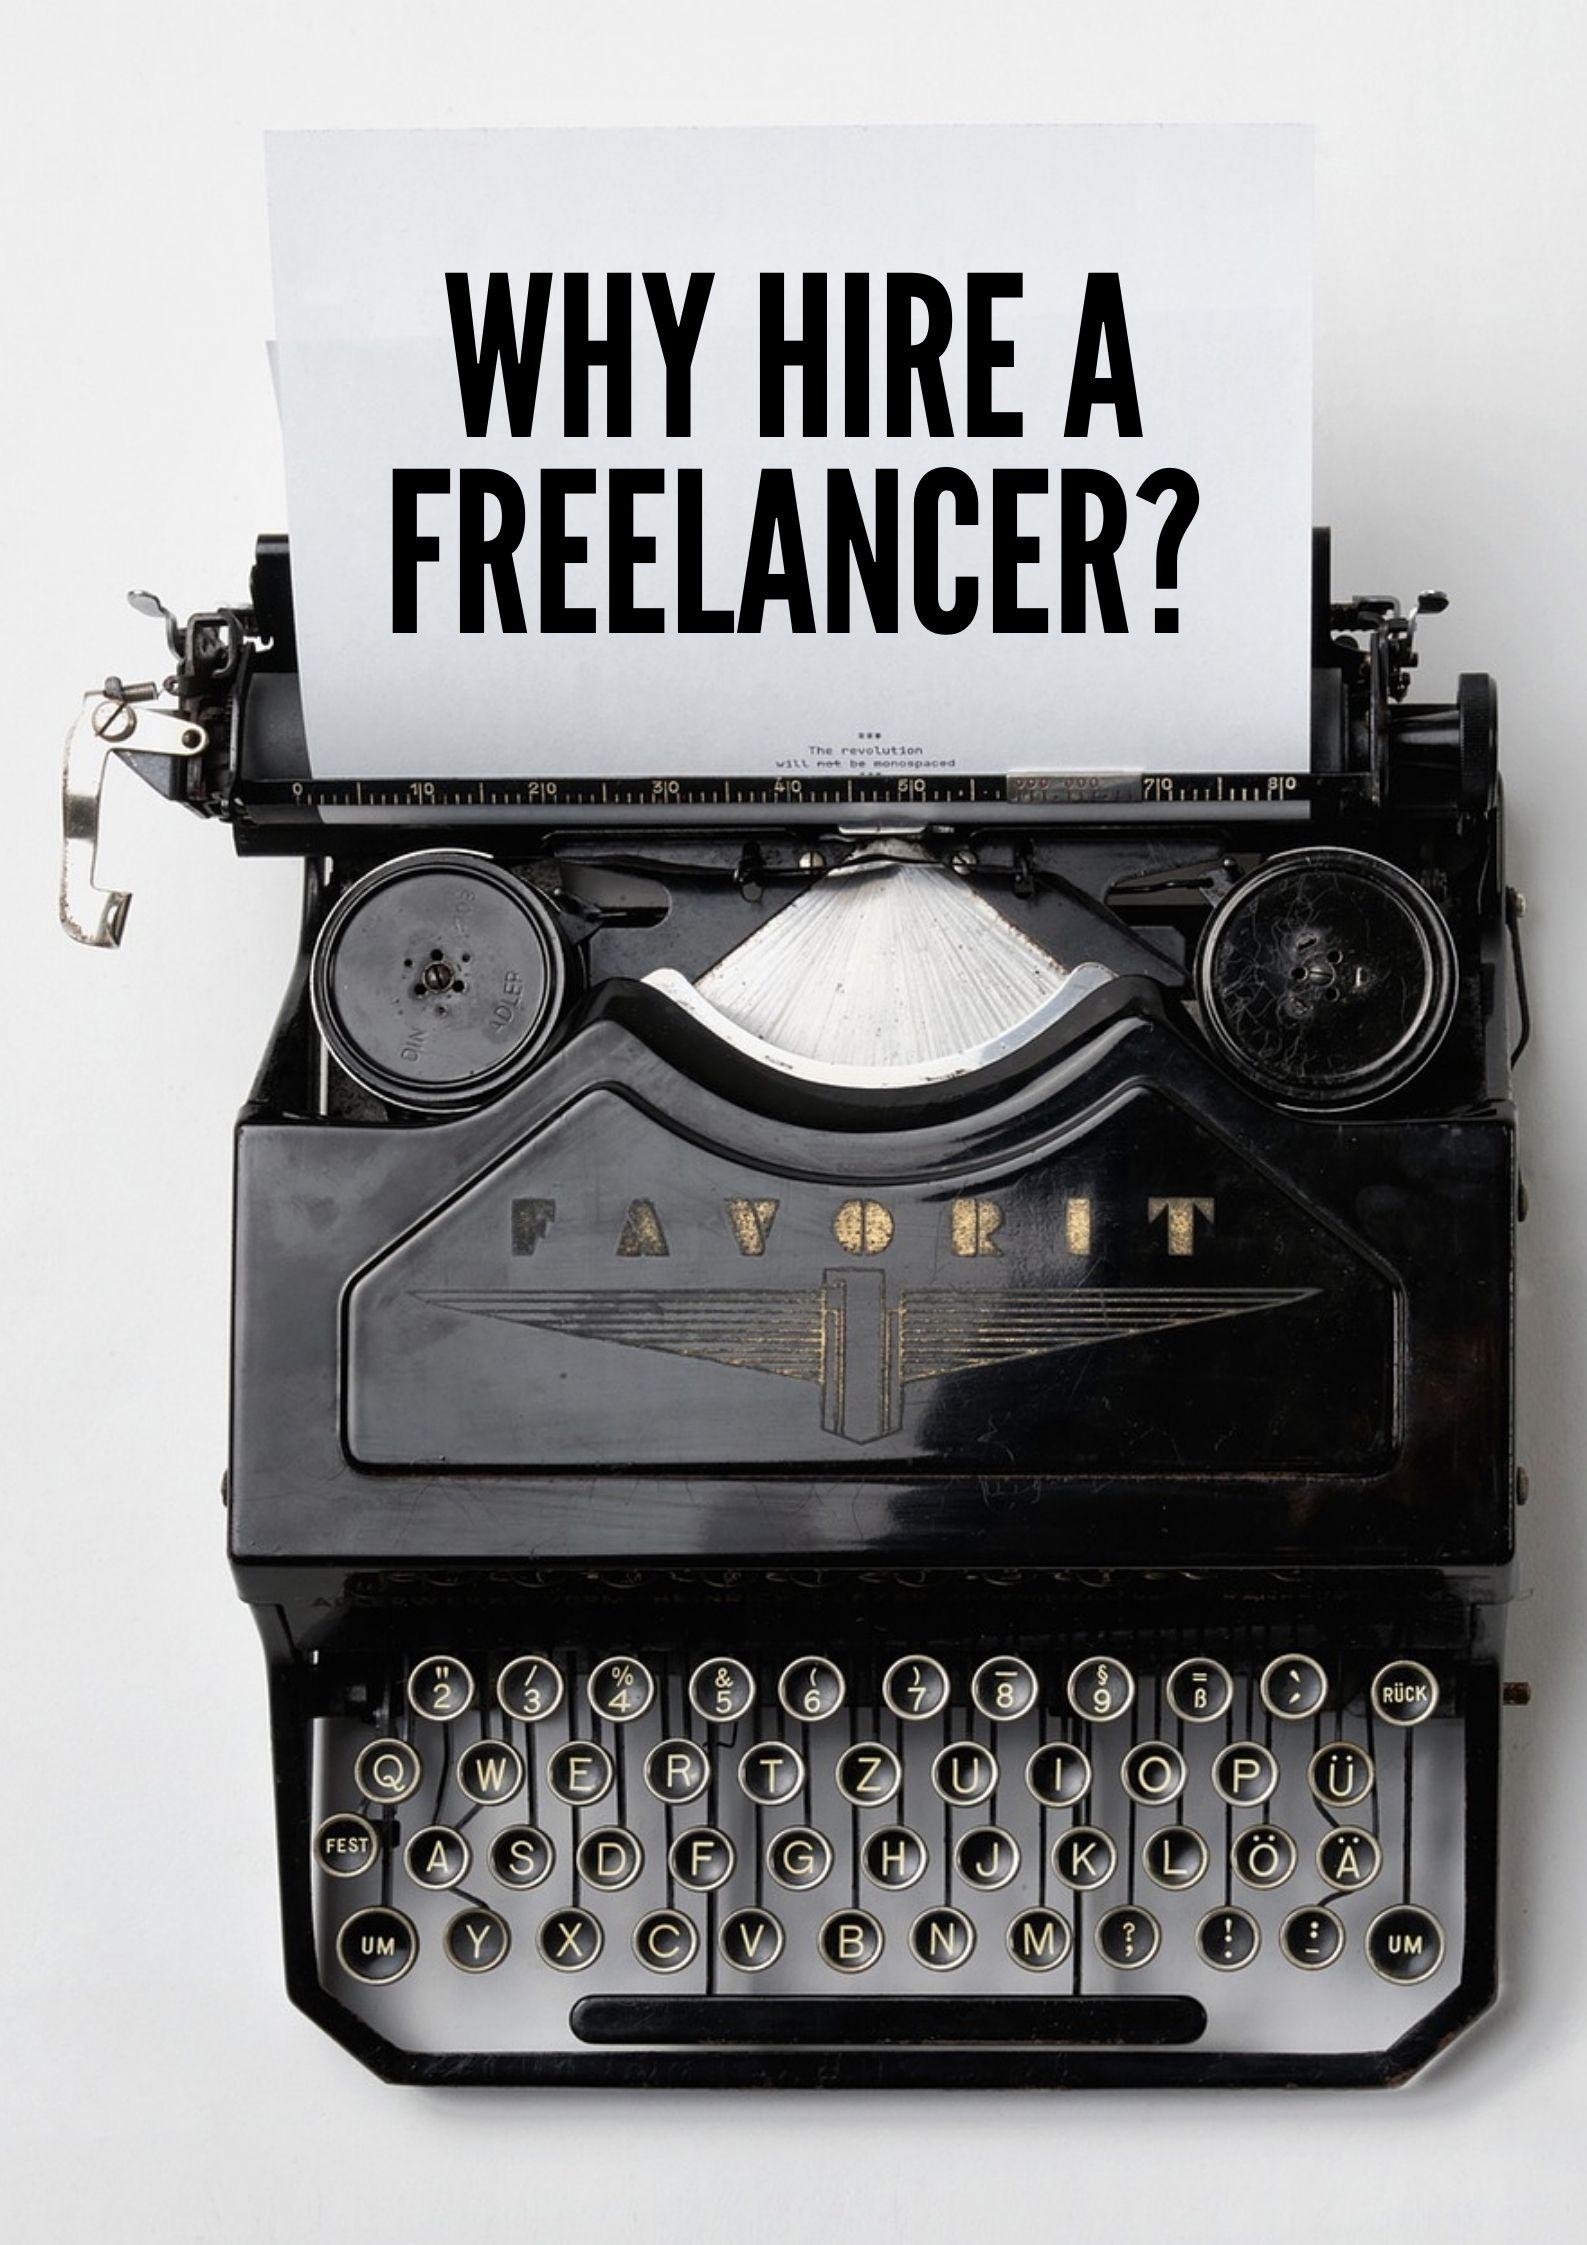 Why Hire a Freelancer?